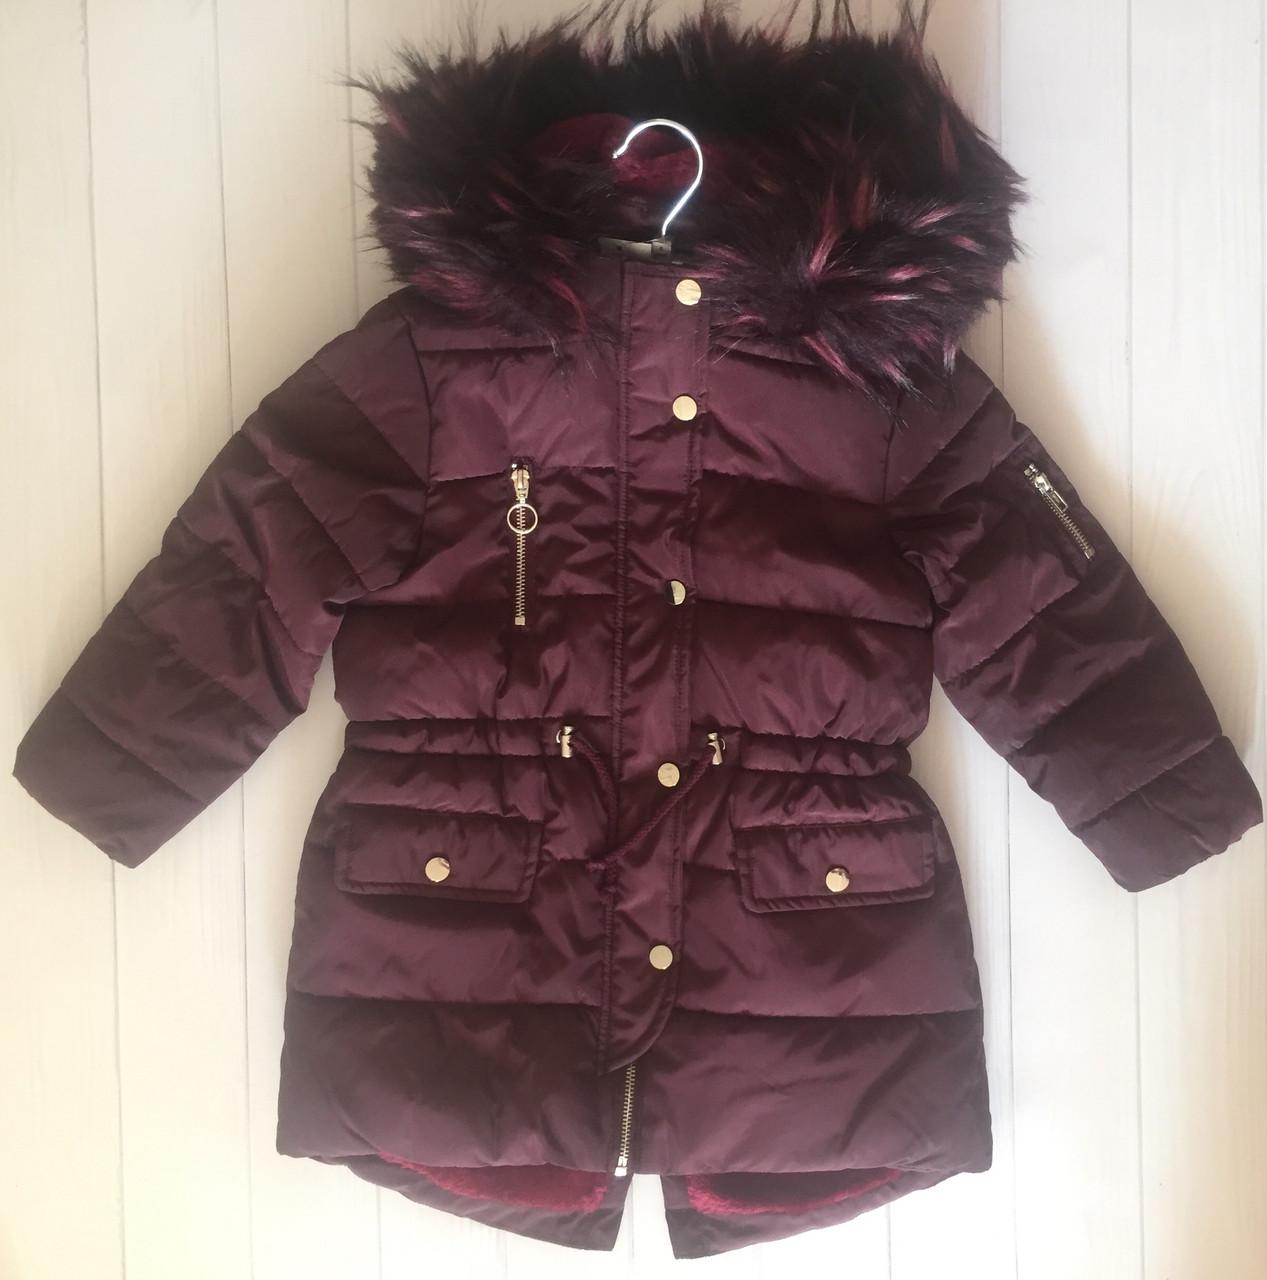 Зимняя куртка с опушкой на девочку Matalan Англия Размер 122